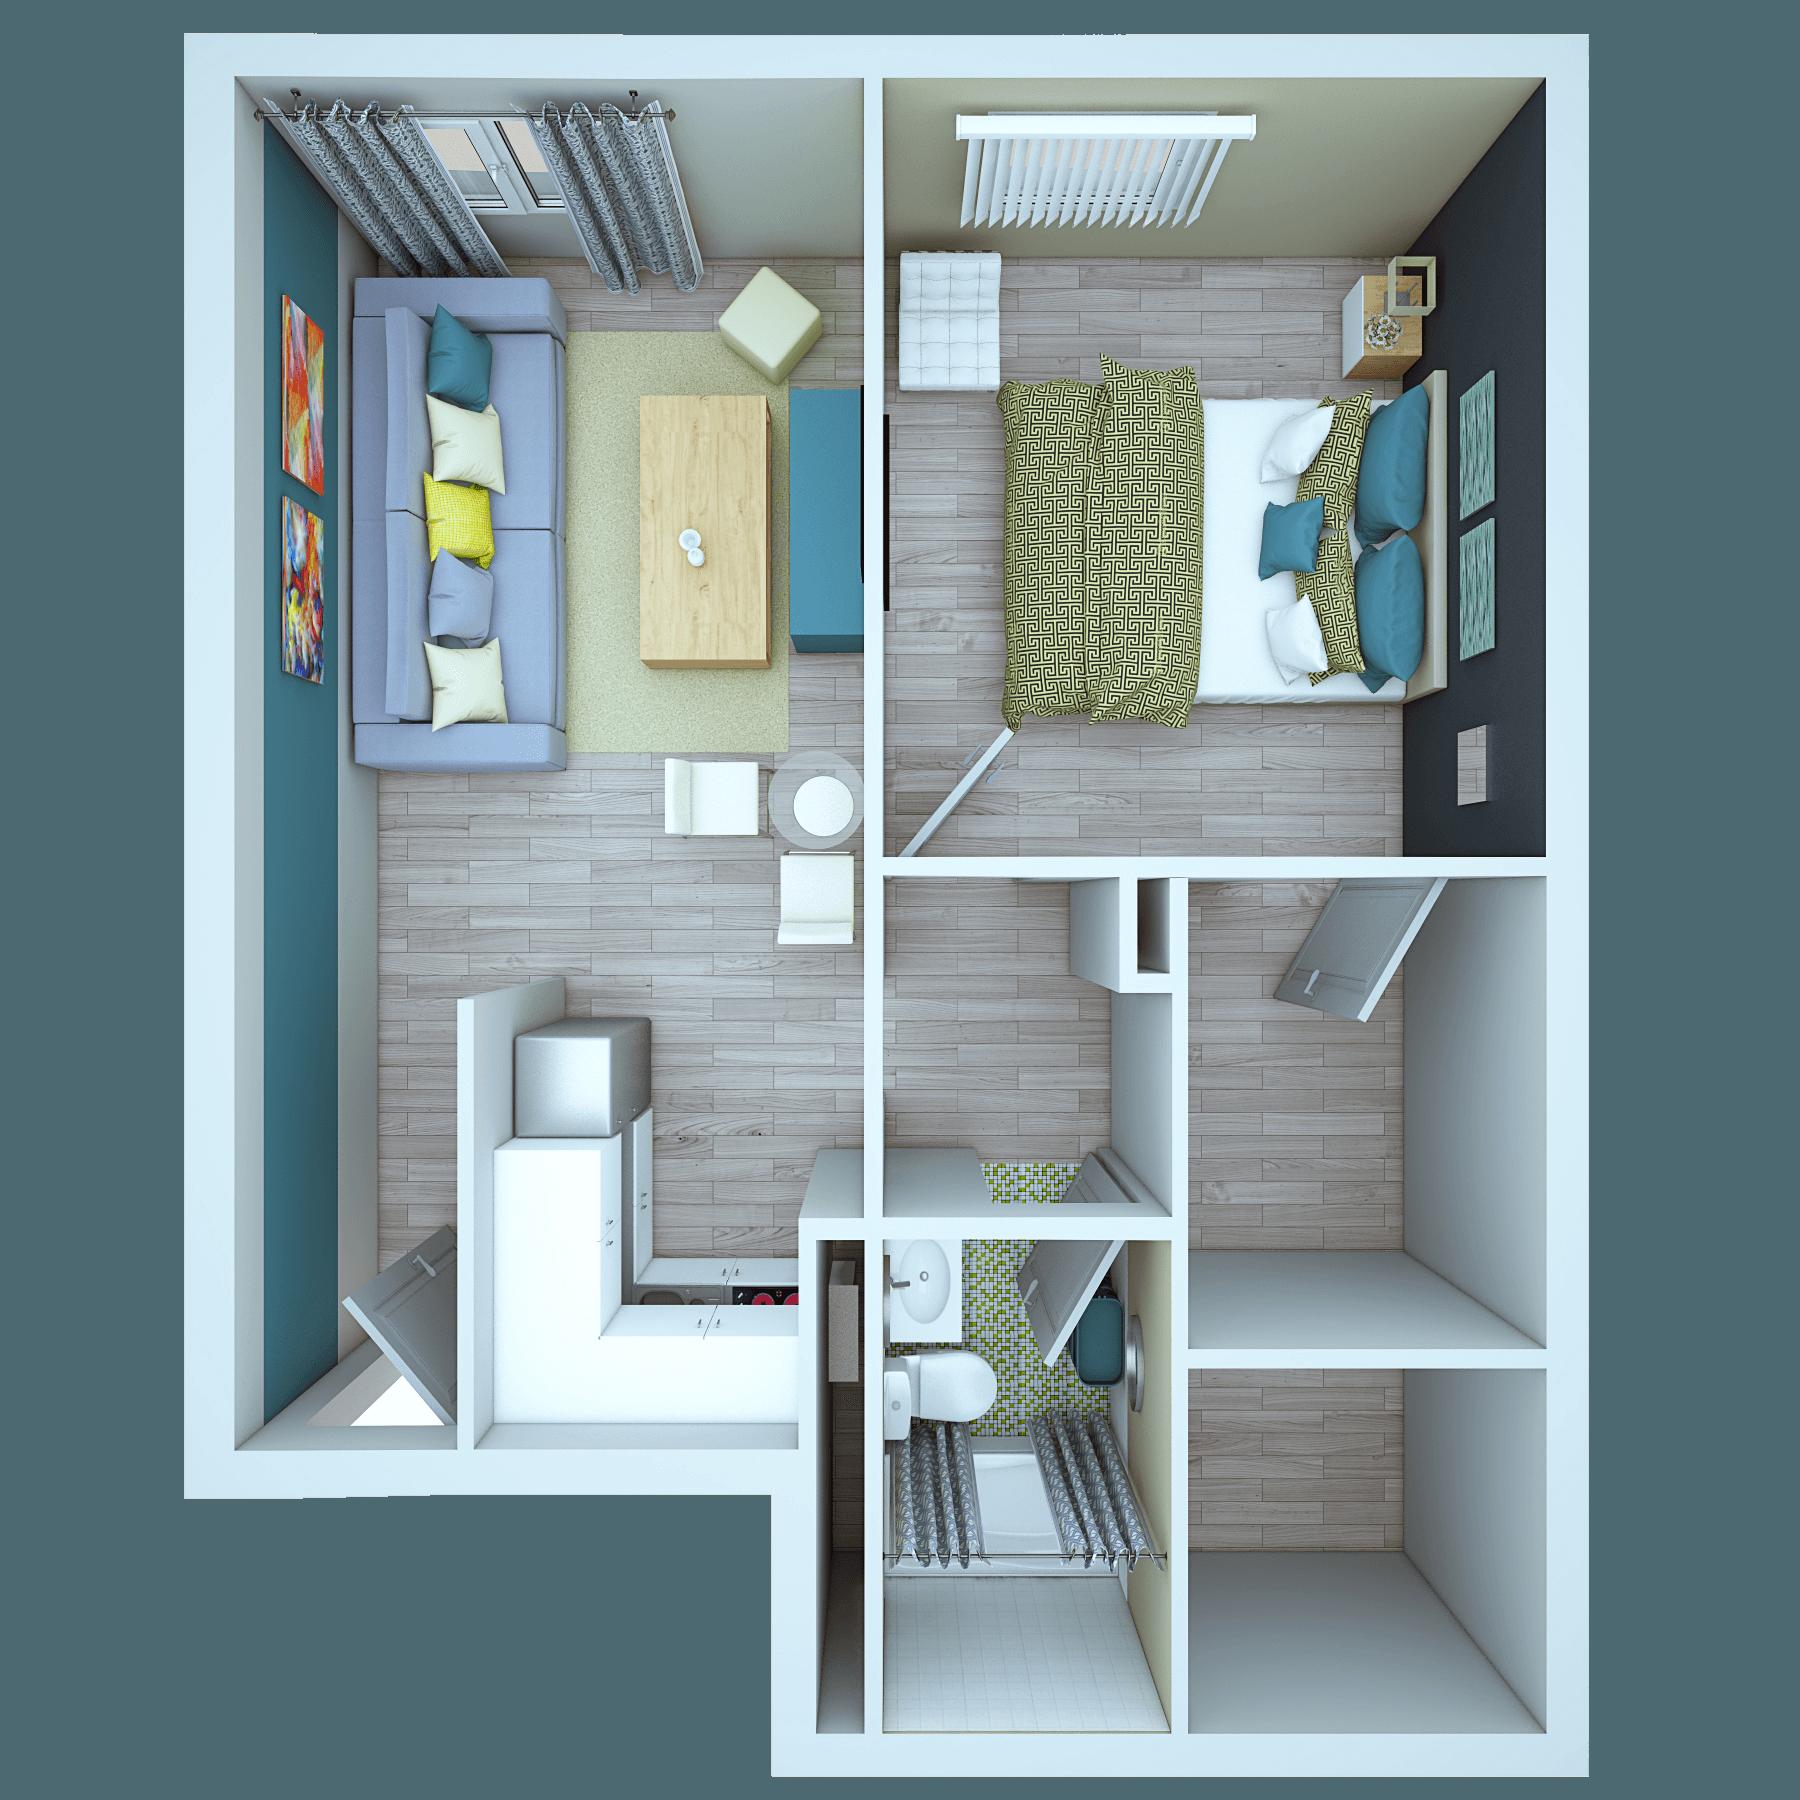 Vue at 3rd Top View Bedroom Bathroom Living Room